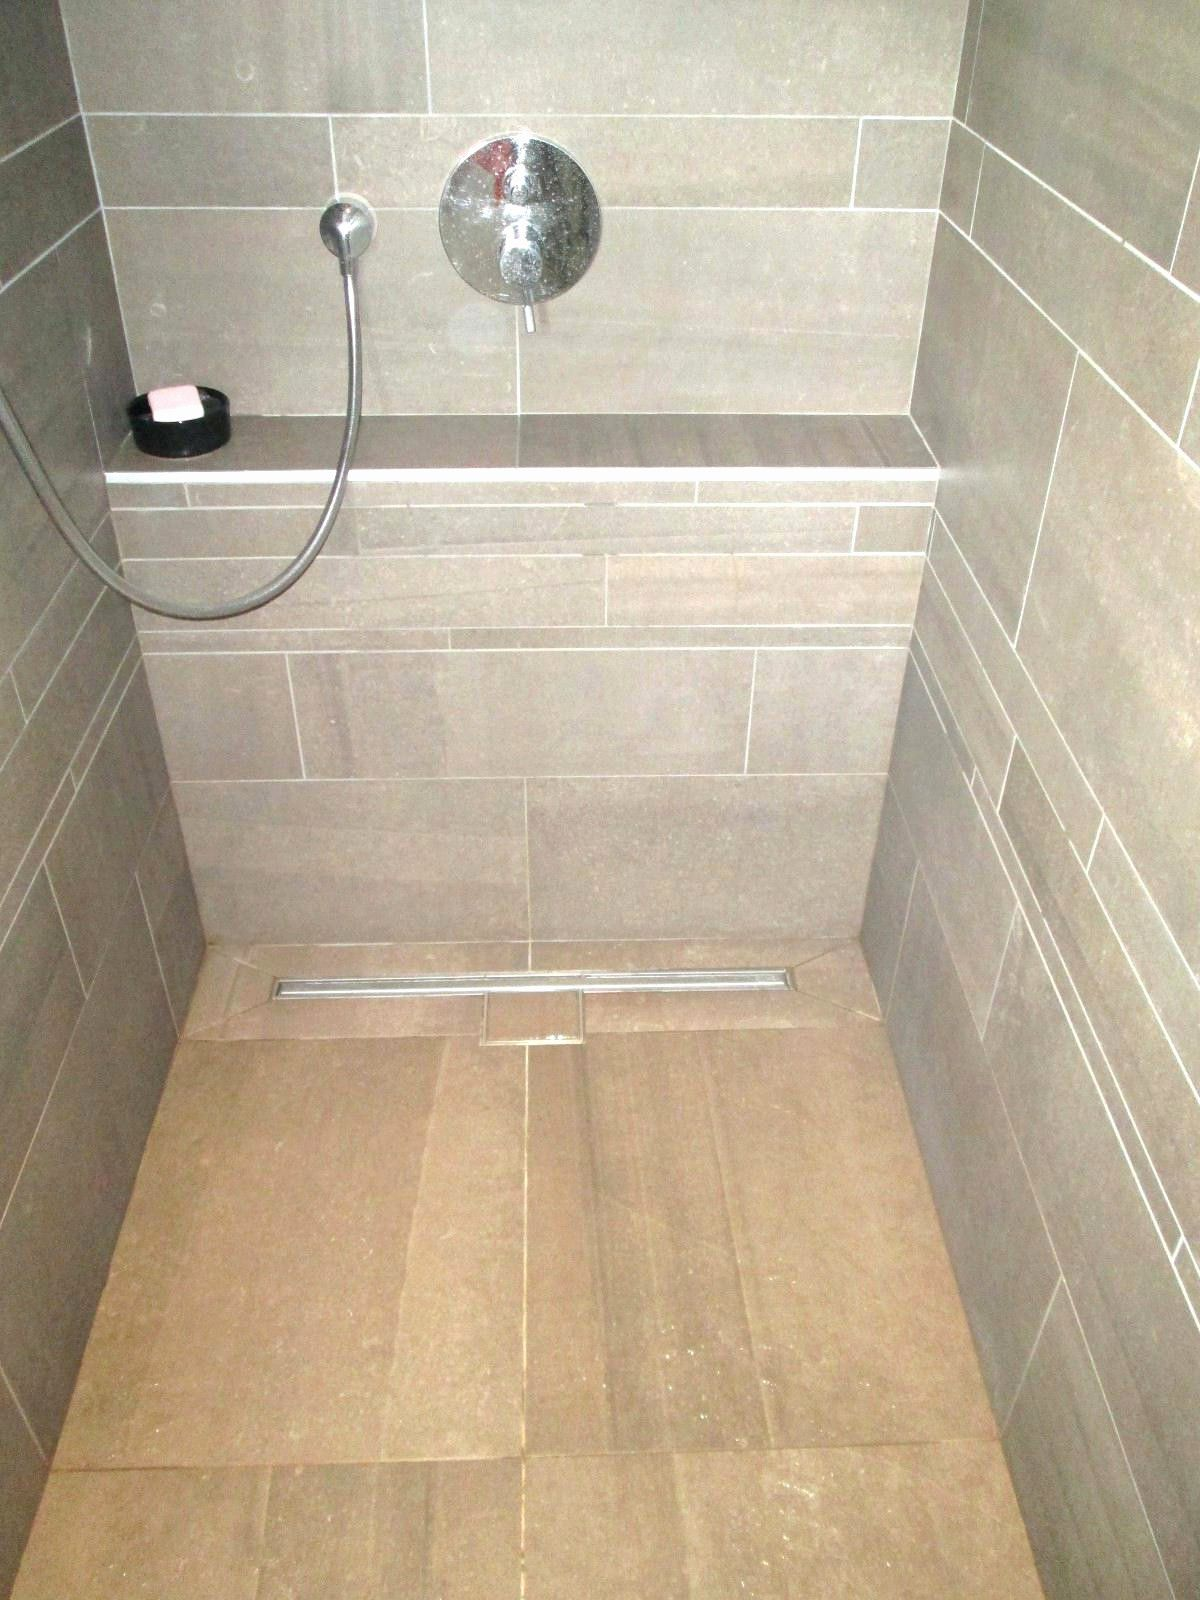 Autocollant Antiderapant Pour Baignoire De Nos Equipes De Redaction Alcove Bathtub Bathtub Bathroom